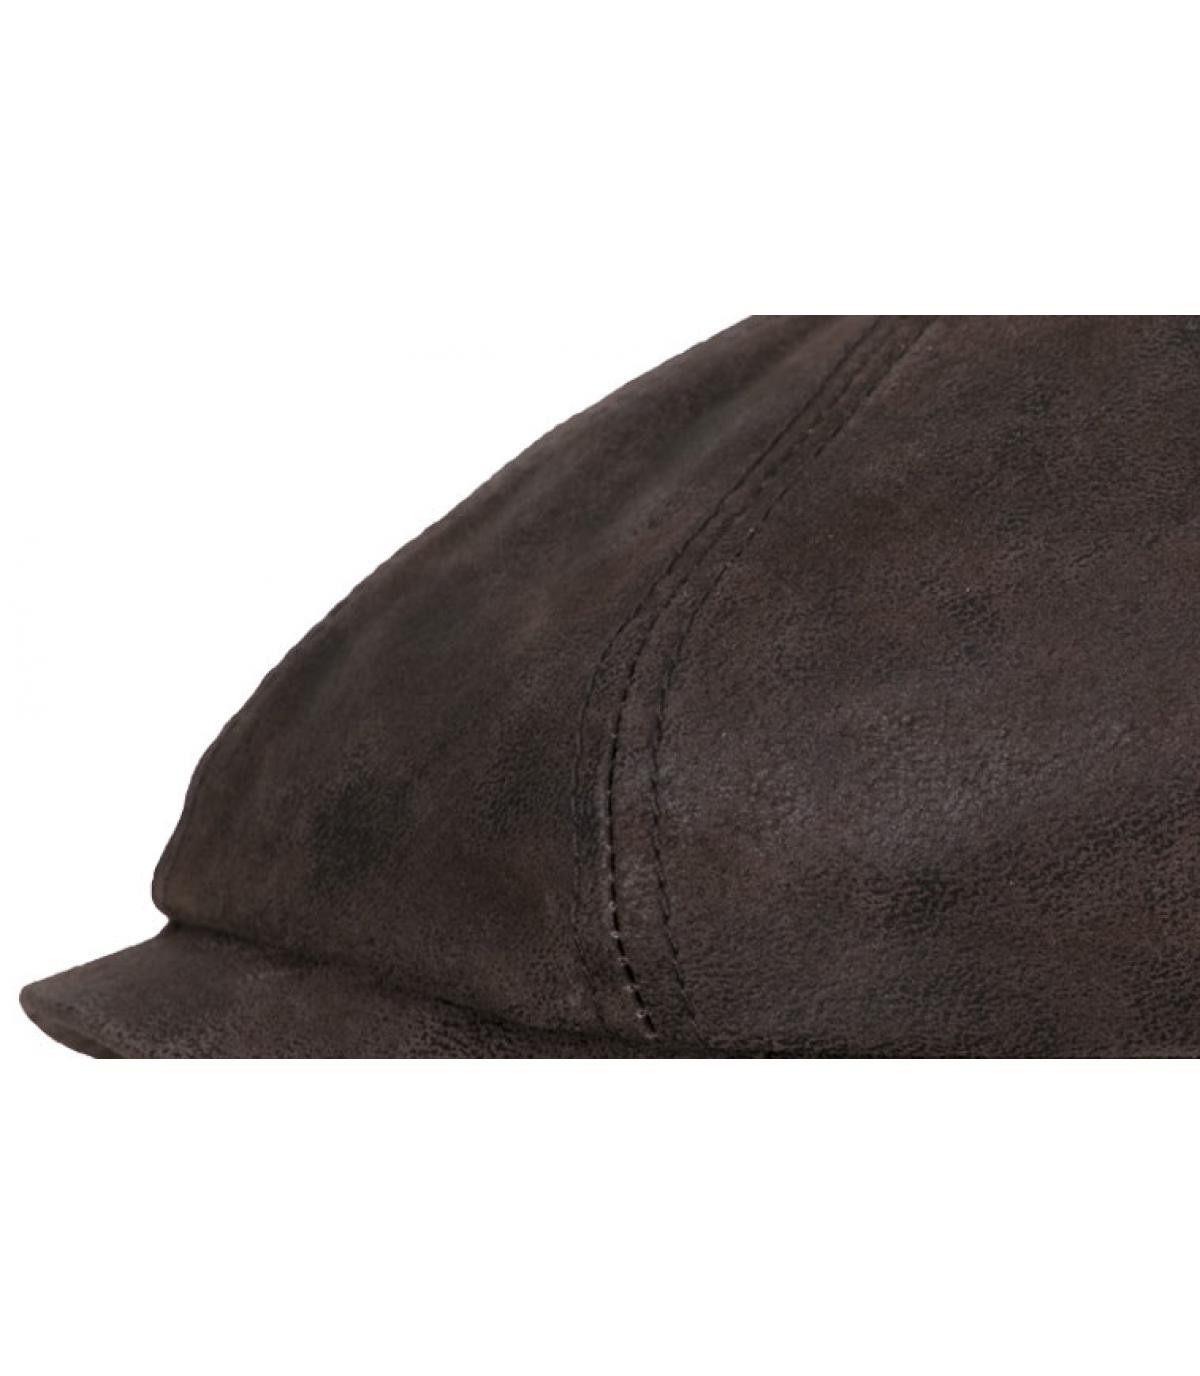 Gorra cuir brun